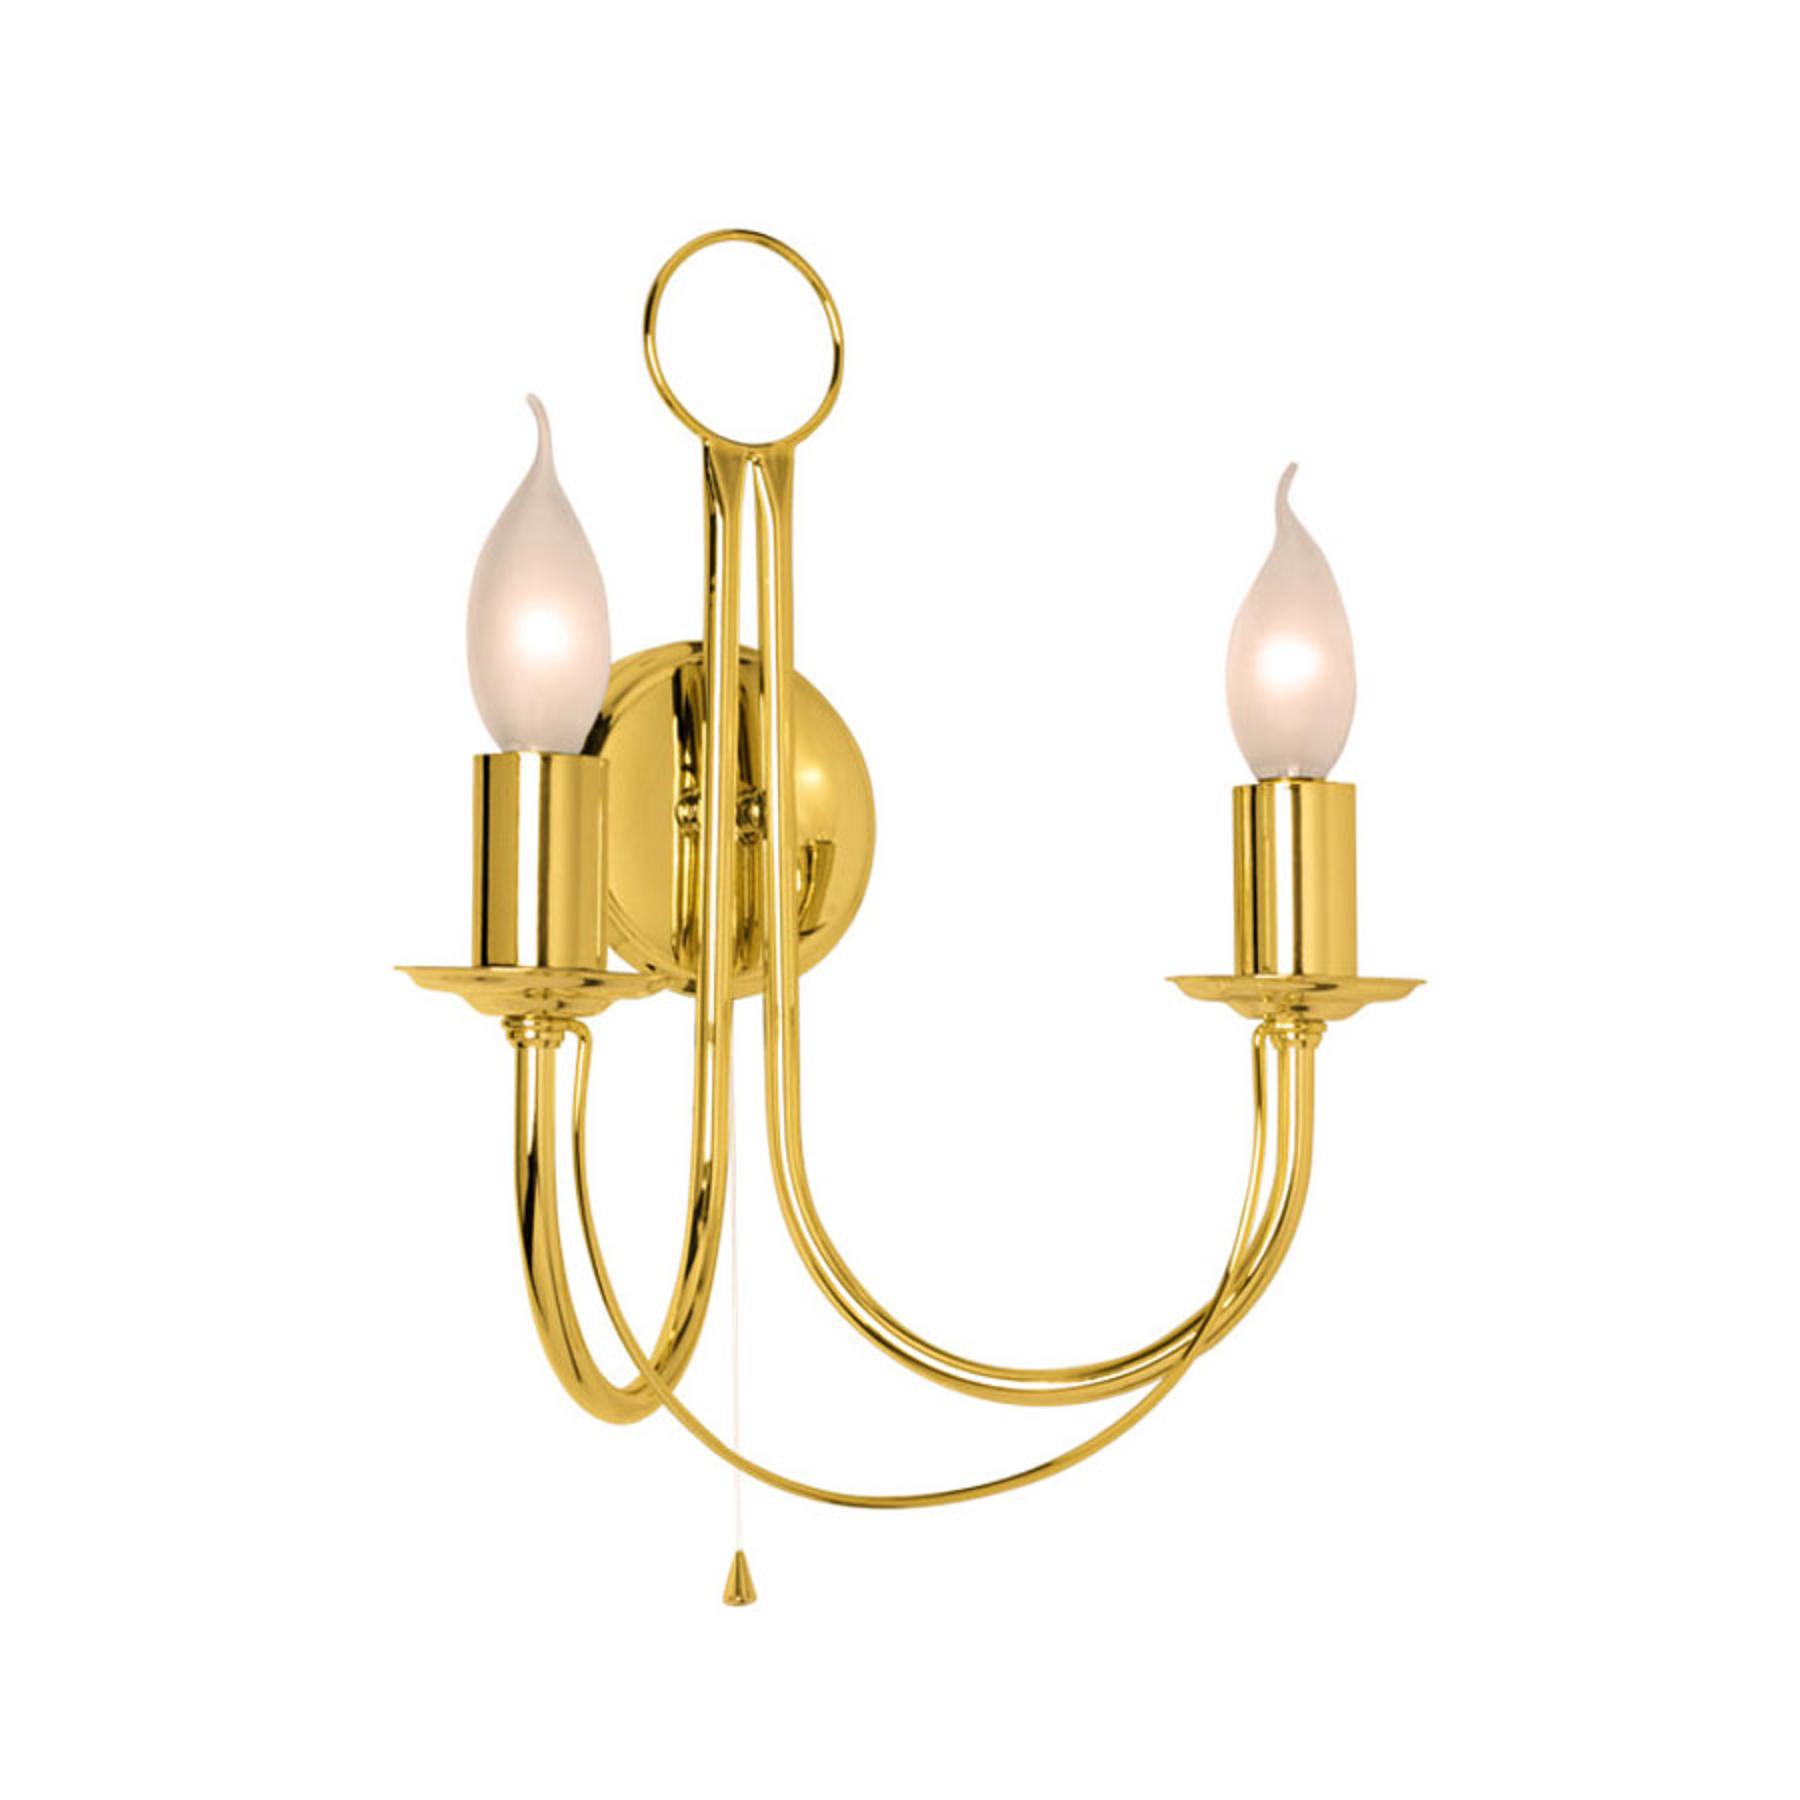 Wandlamp Retro, 2-lamps, goud